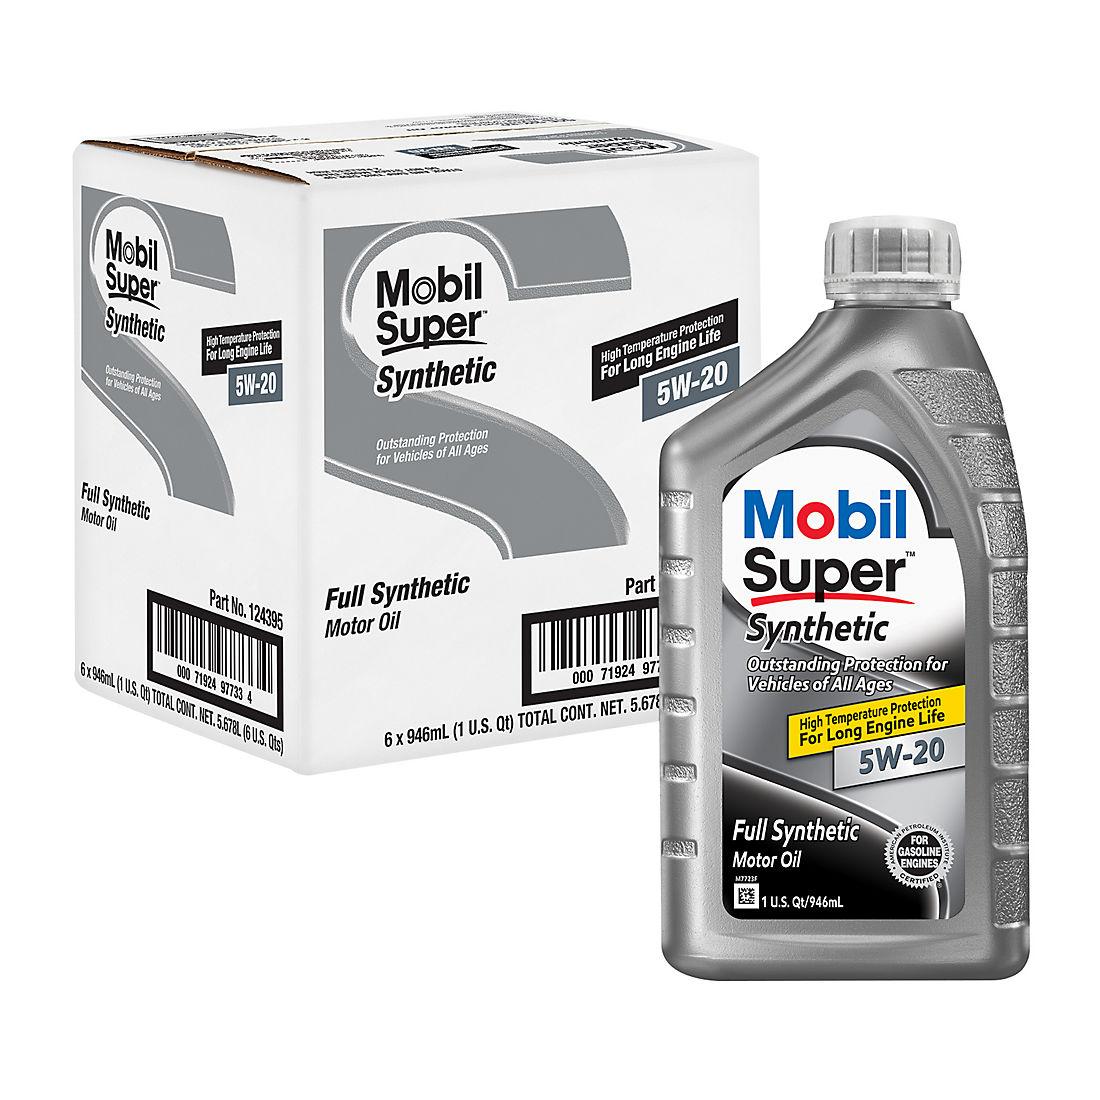 picture regarding Mobil 1 Oil Change Coupons Printable identified as Mobil 5W-20 Tremendous Artificial Engine Oil, 6 pk./1 qt.